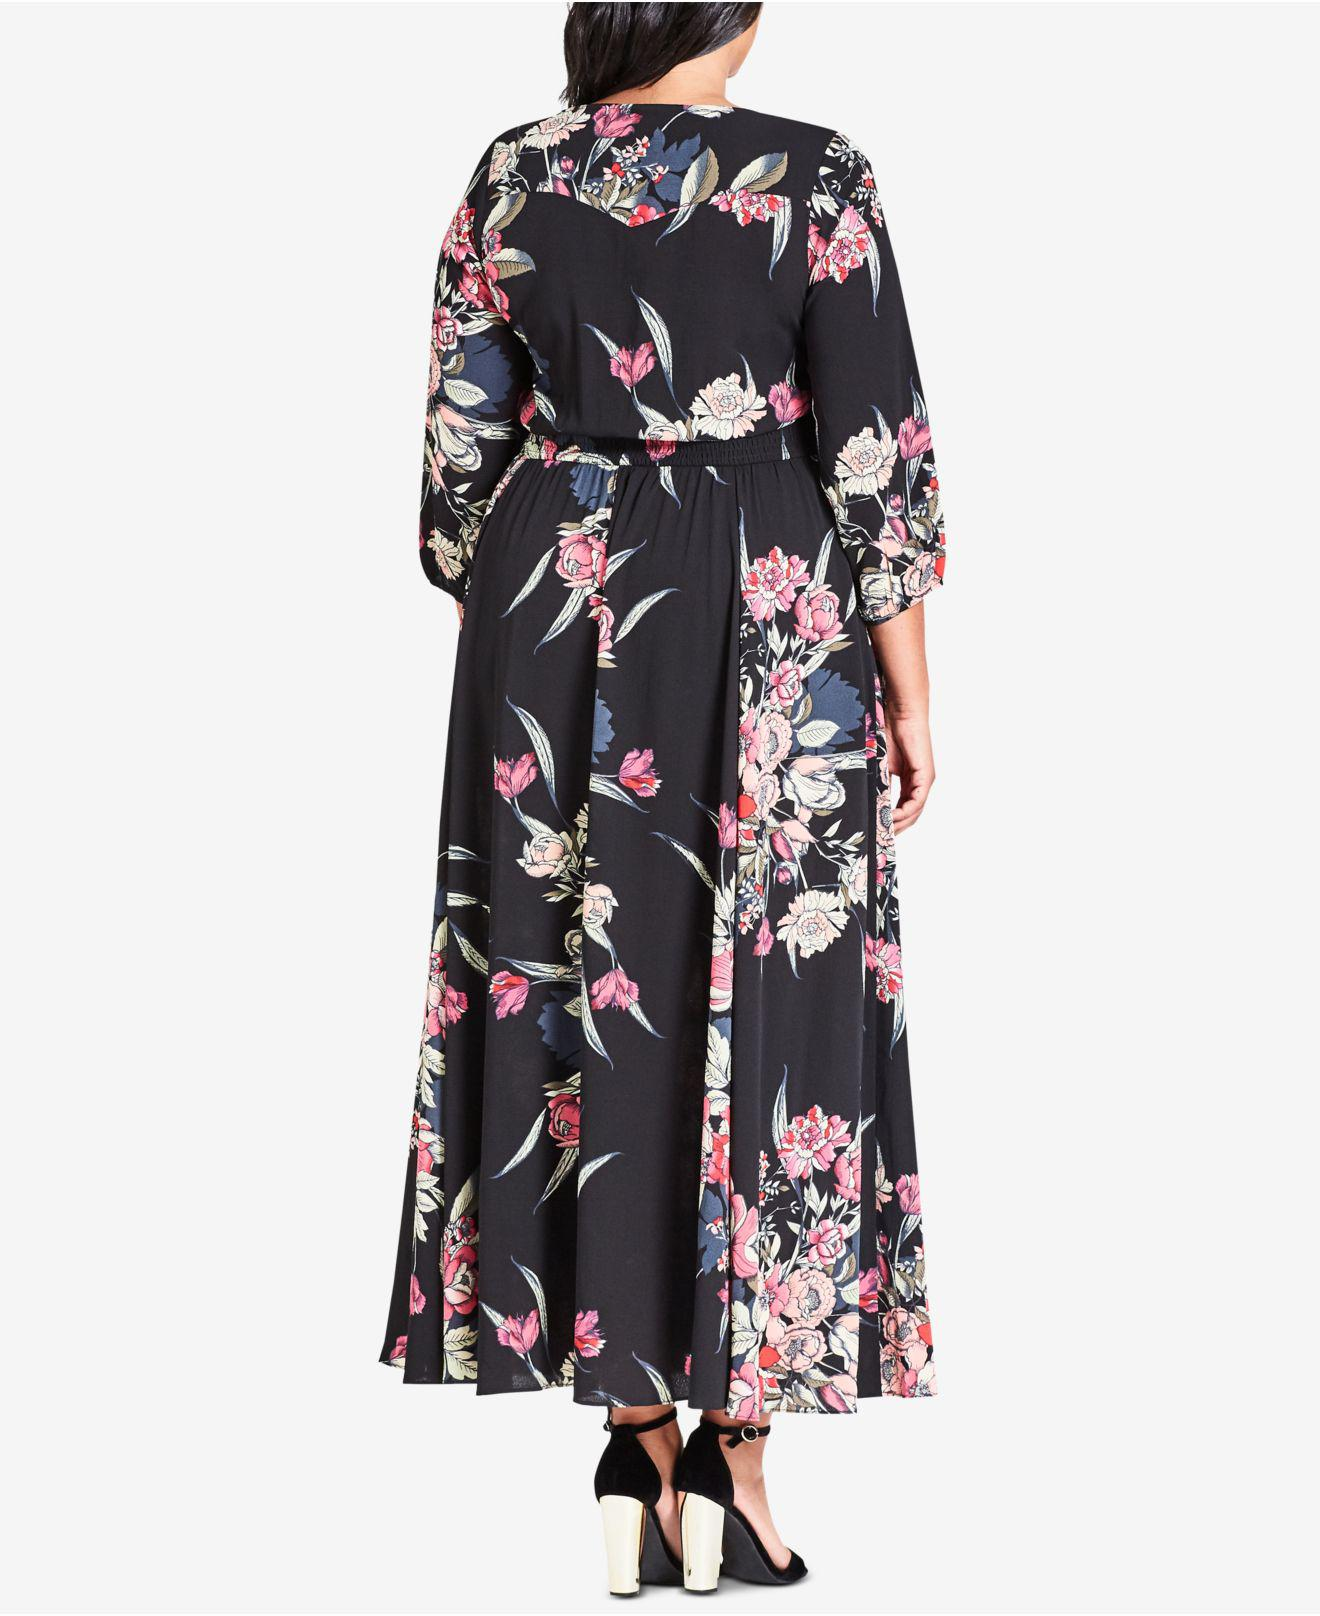 643c6f1c2ab Lyst - City Chic Trendy Plus Size Floral-print Fit   Flare Maxi Dress